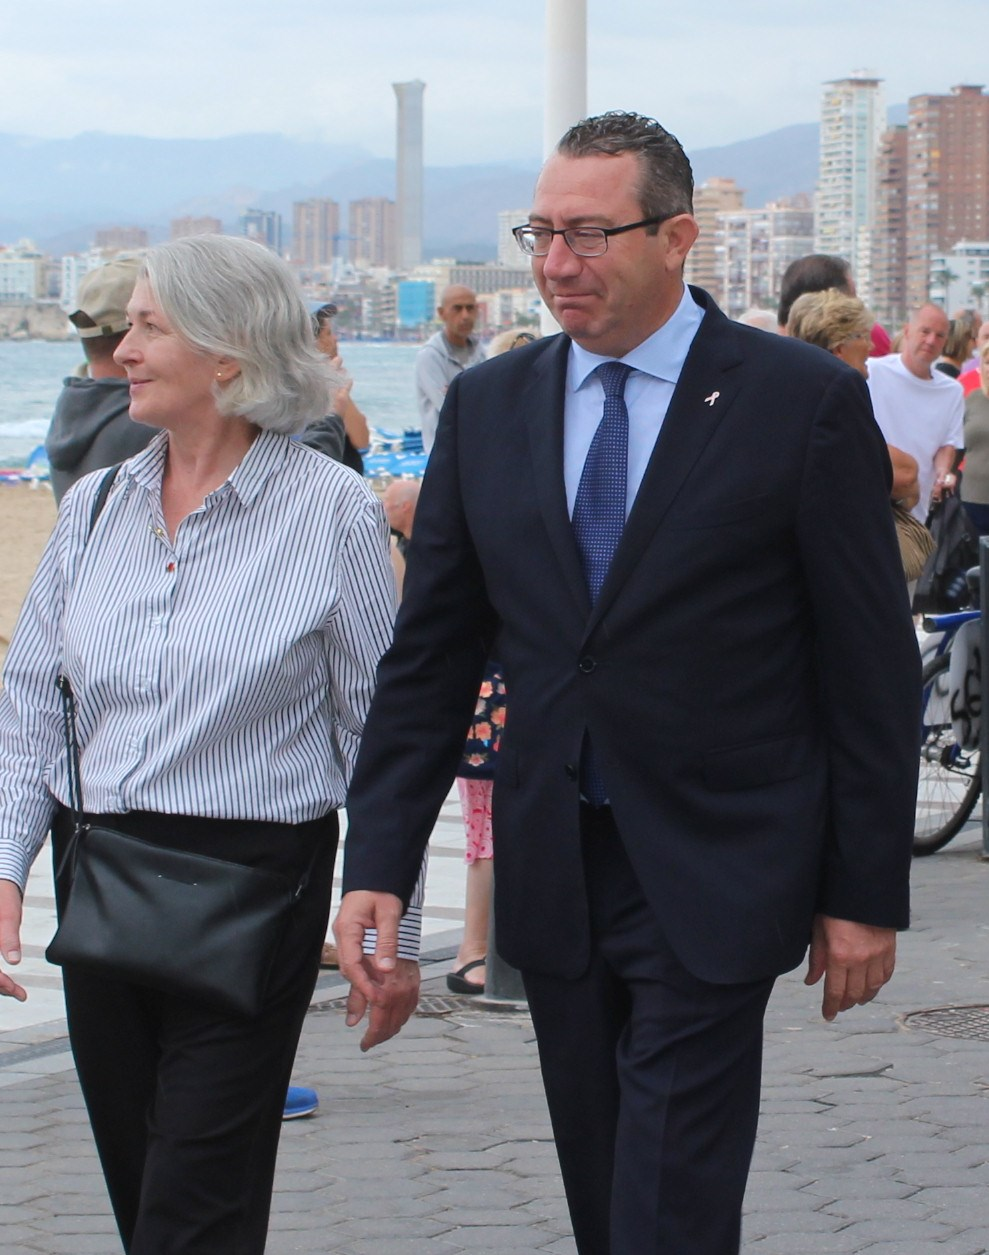 Mayor Toni Perez strolling through Benidorm with British Vice Consul Elizabeth Bell